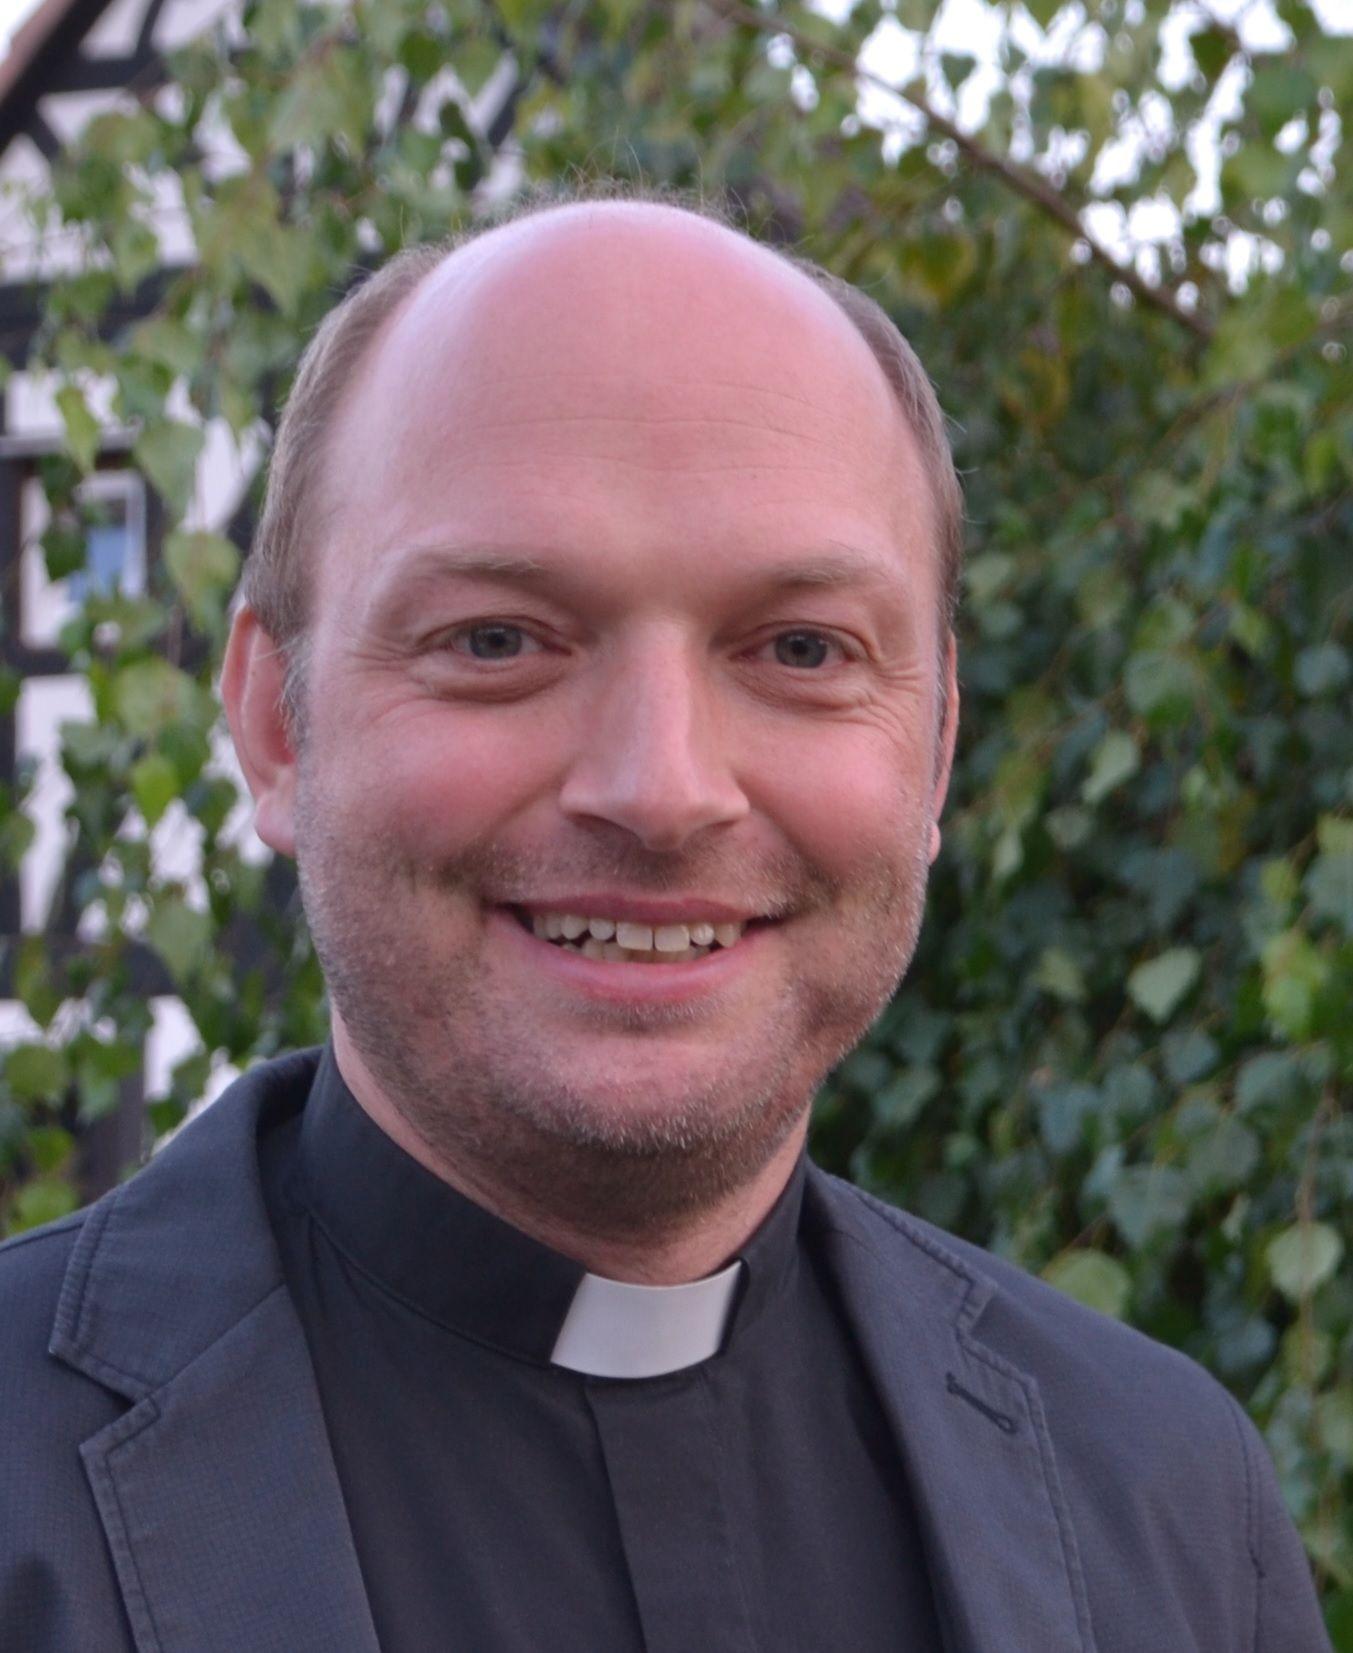 Pfarrer Michael Ottersbach